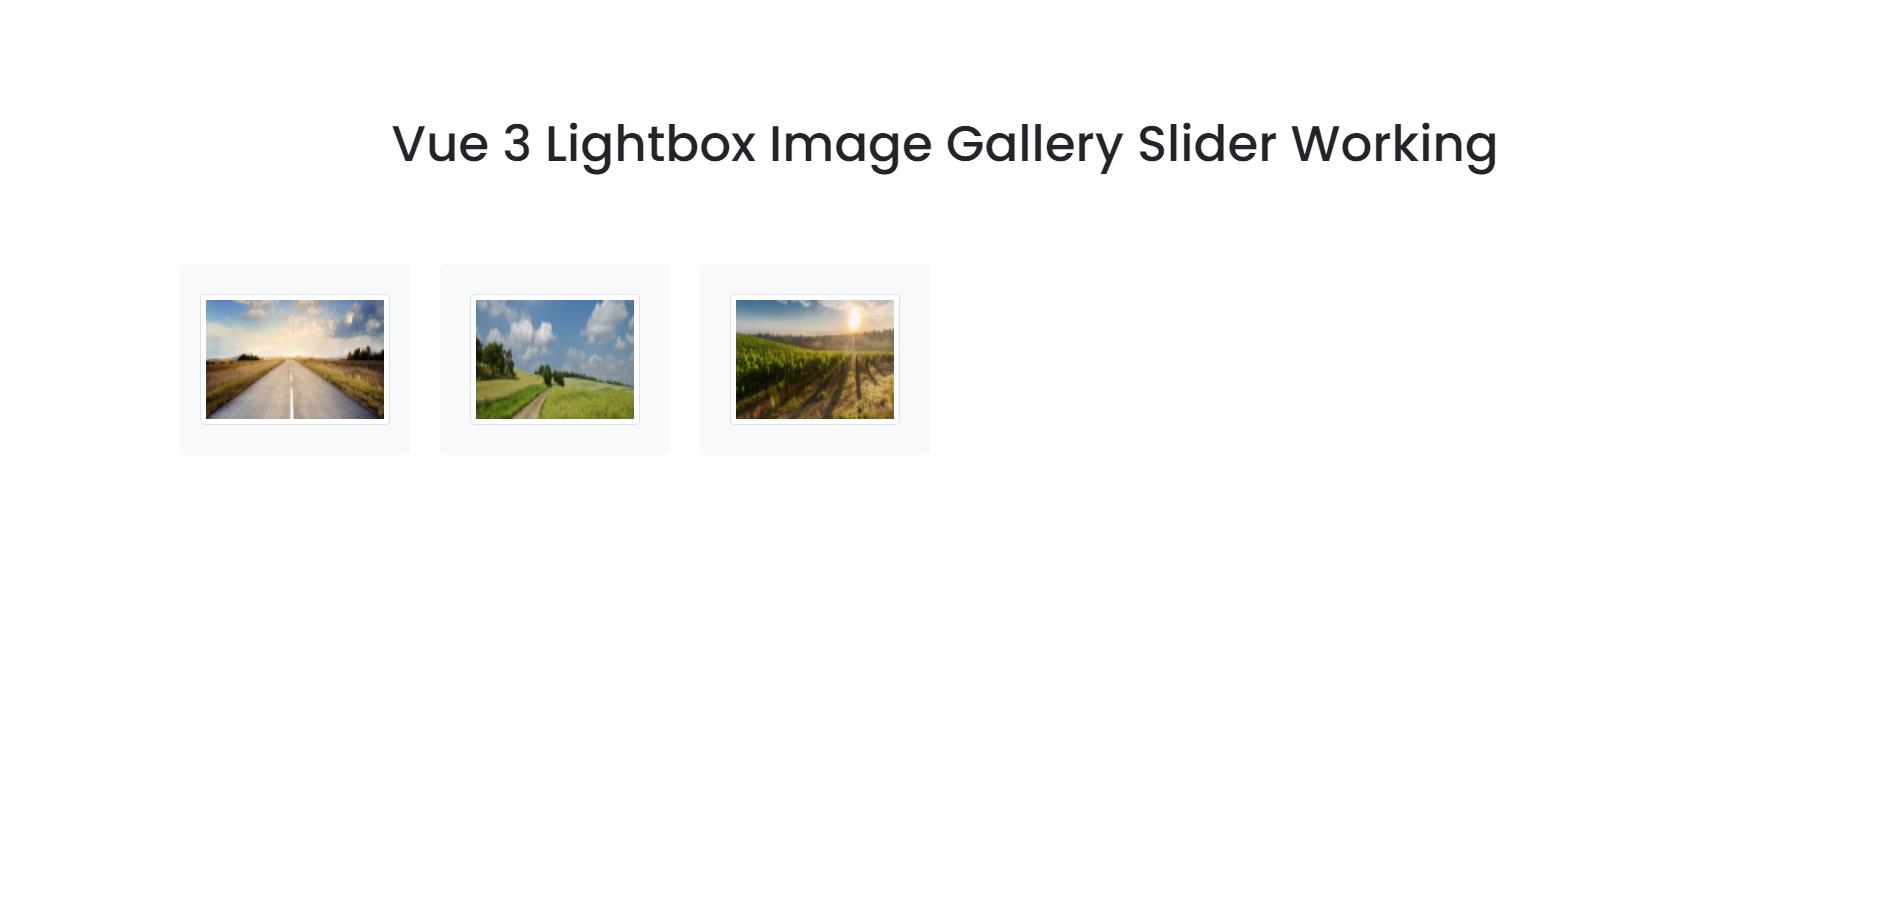 Vue 3 Lightbox Image Gallery Slider Working Functionality